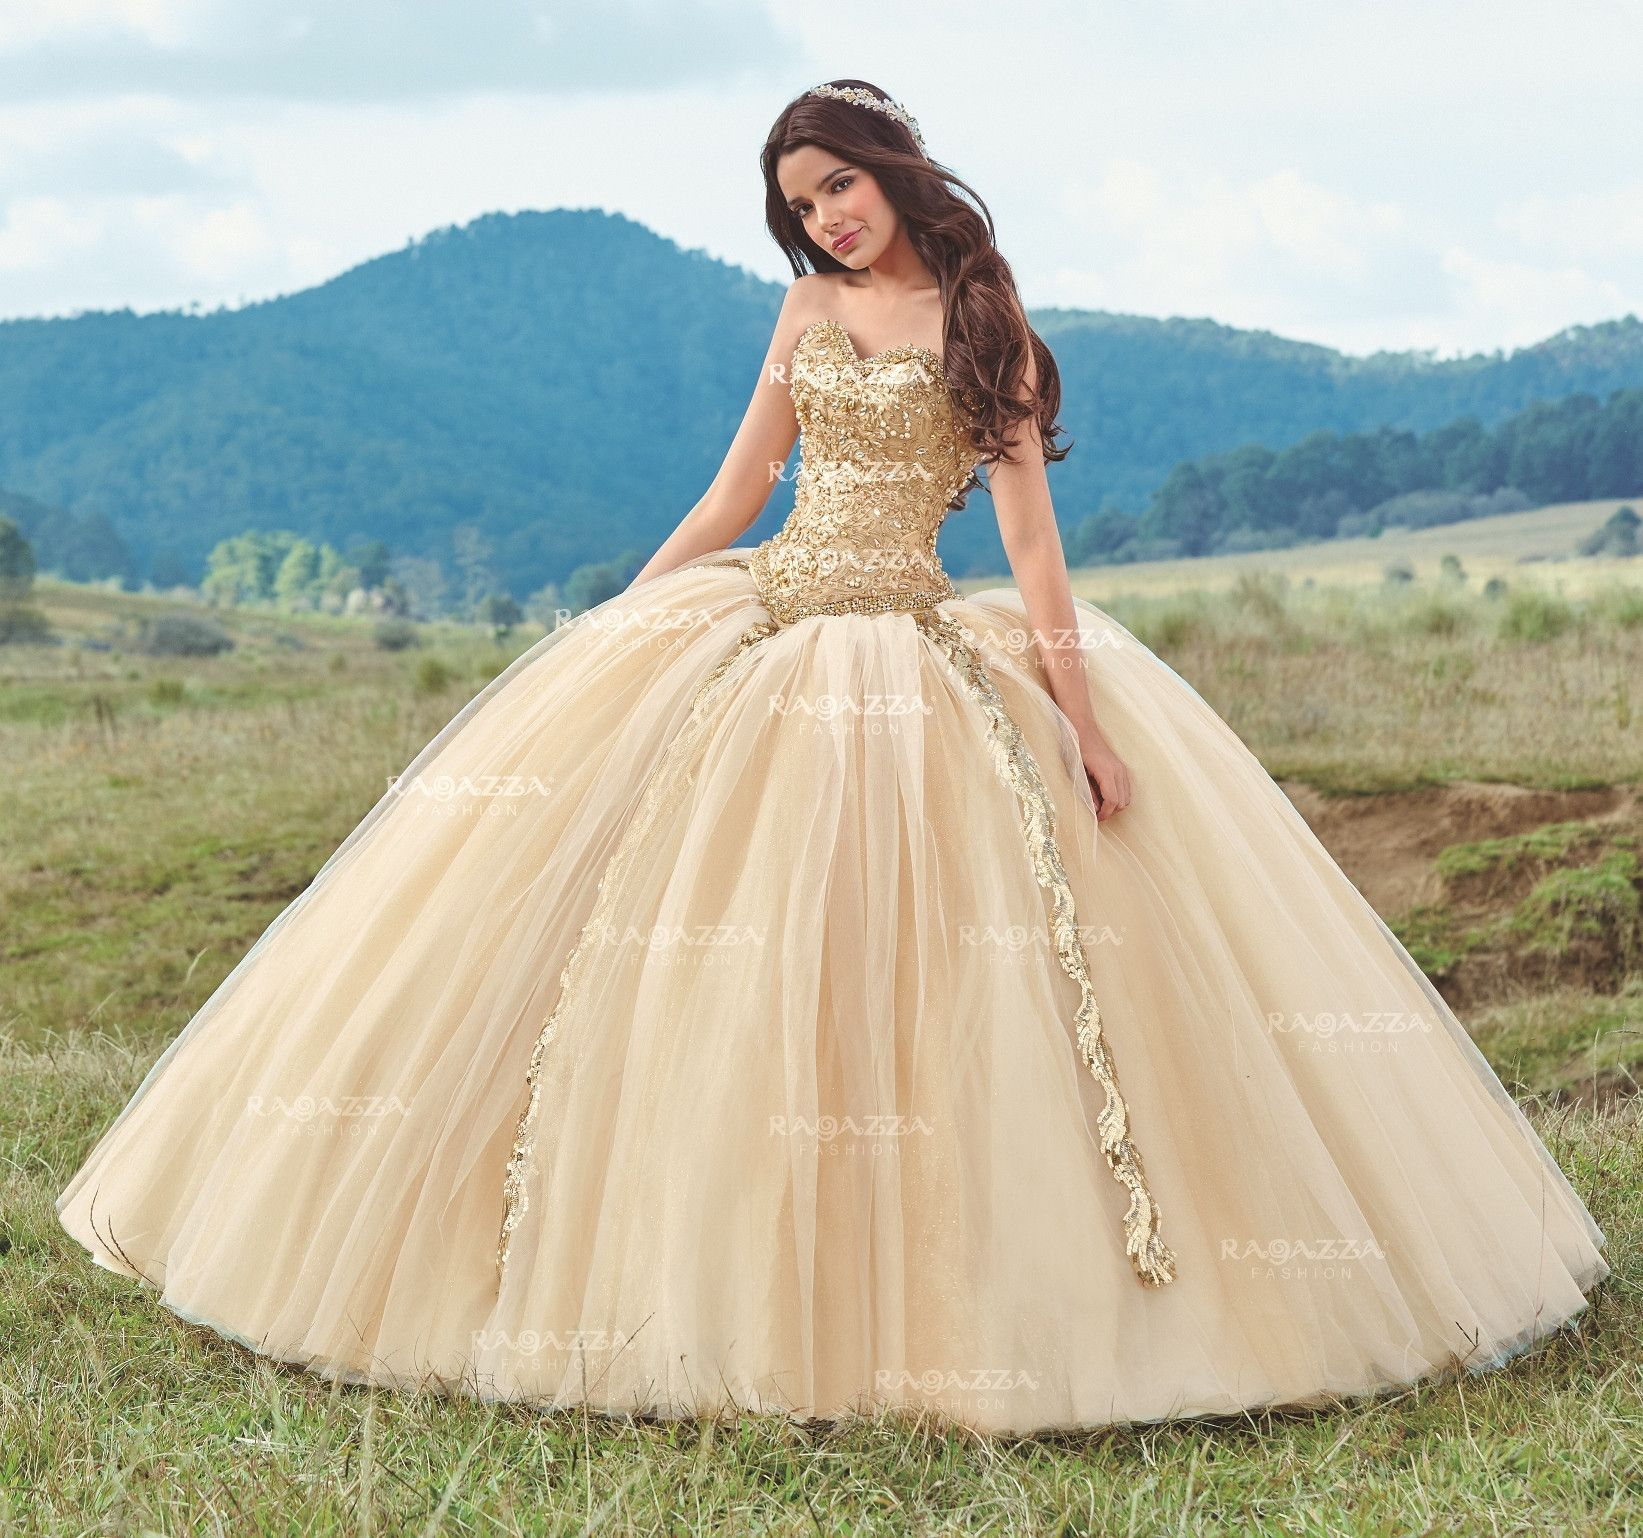 ebcb16685 Beaded Strapless Quinceanera Dress by Ragazza Fashion Style B75-375